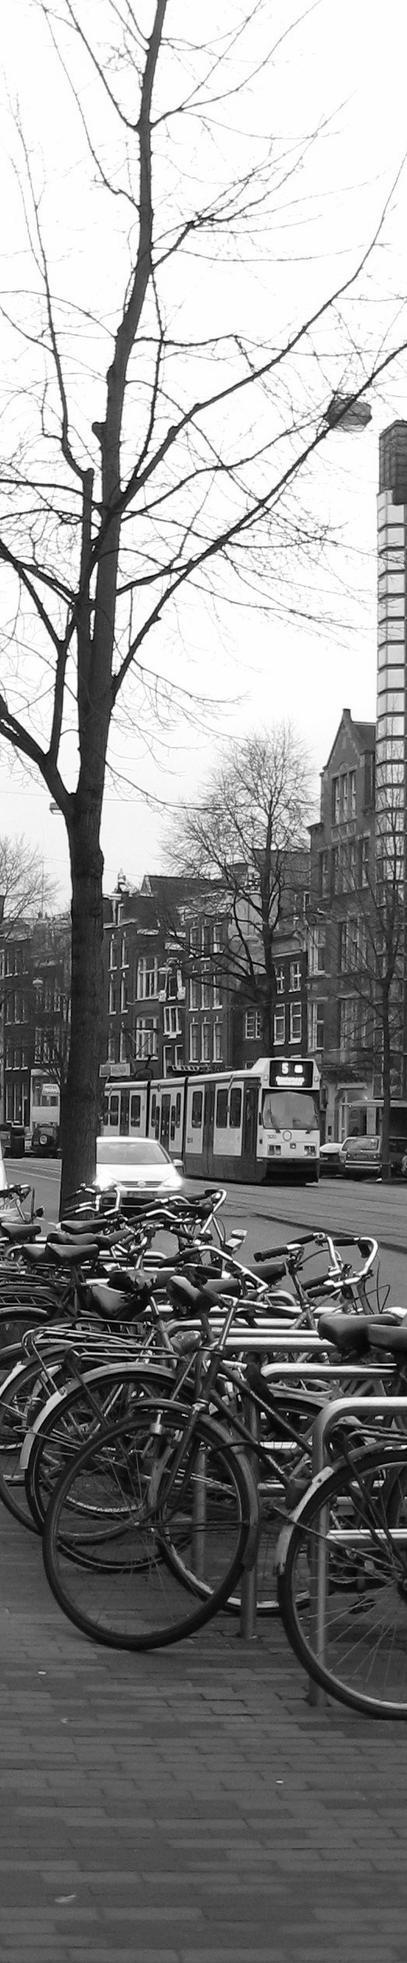 Street, bikes... of Amsterdam by Muze-hic